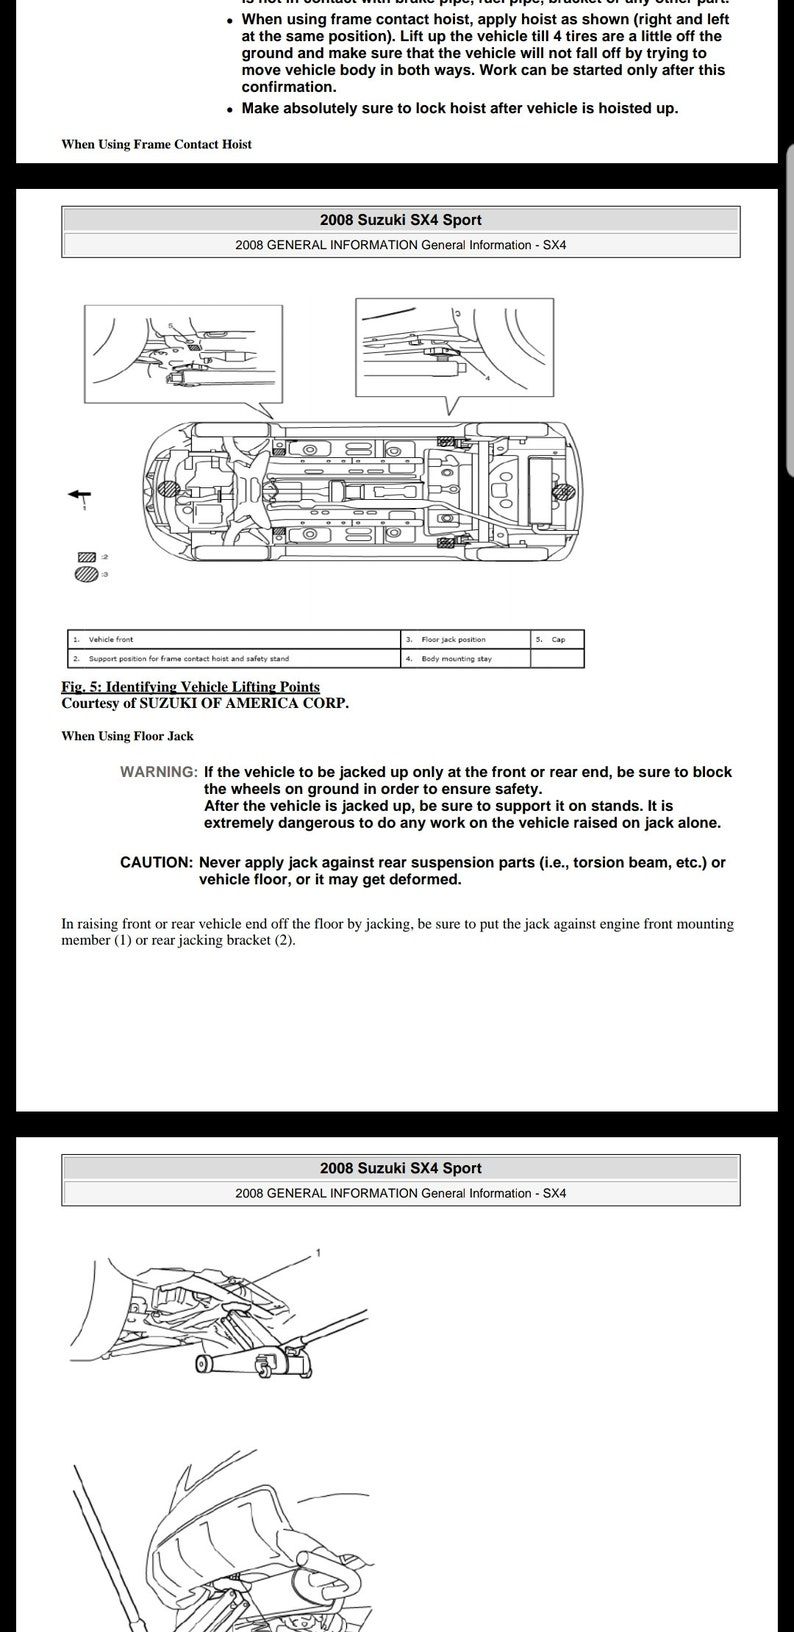 Suzuki SX4 Sport 2008 Workshop service repair manual INSTANT DOWNLOAD